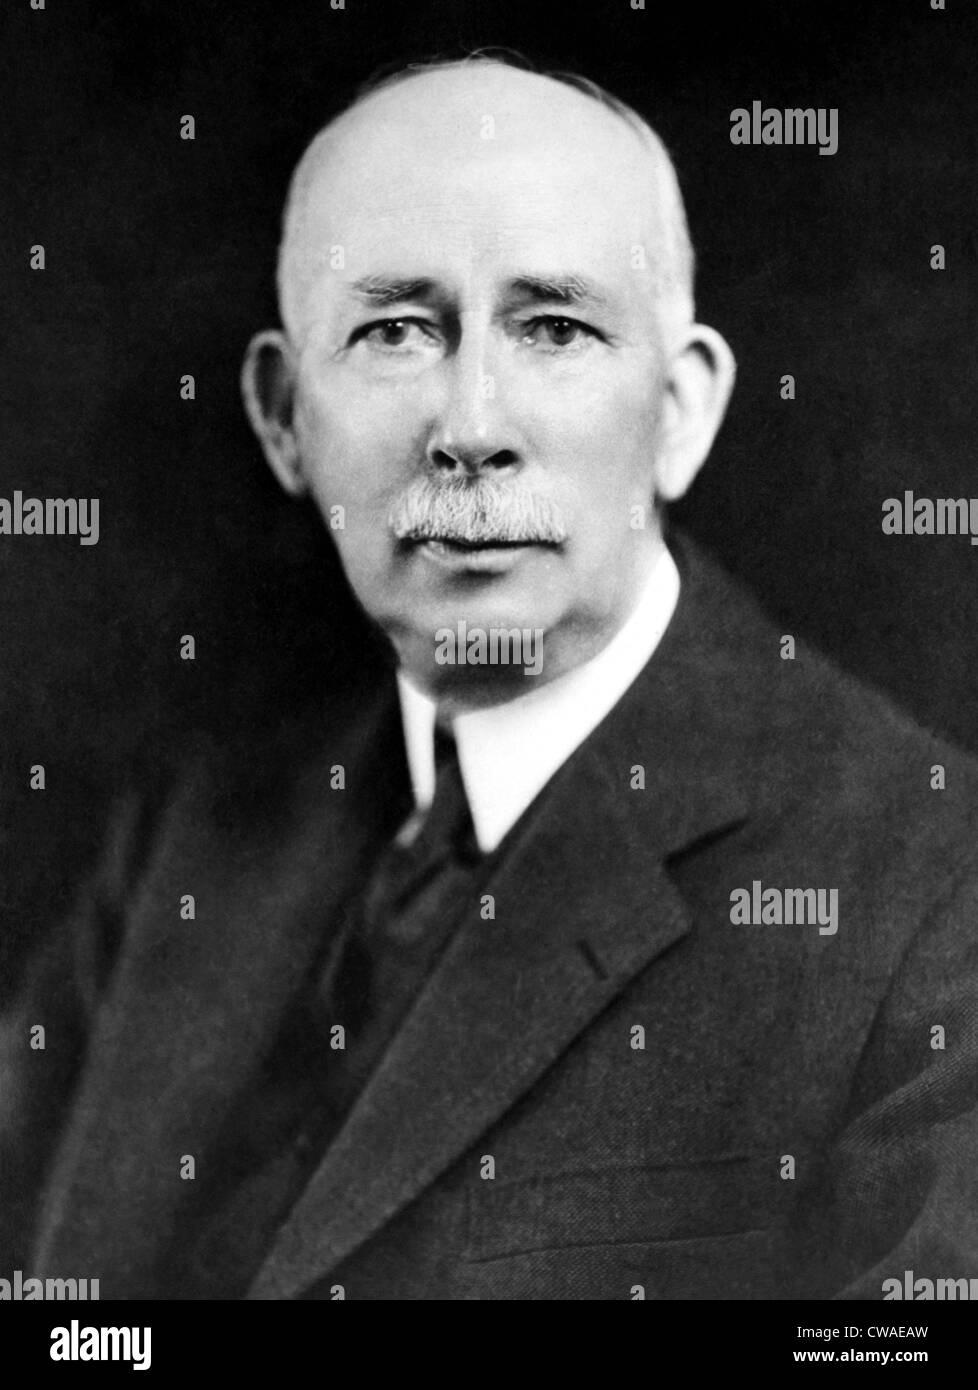 Col. Edward M. House, World War I advisor to the President Wilson.ca 1930s. Courtesy: CSU Archives/Everett Collection. - Stock Image